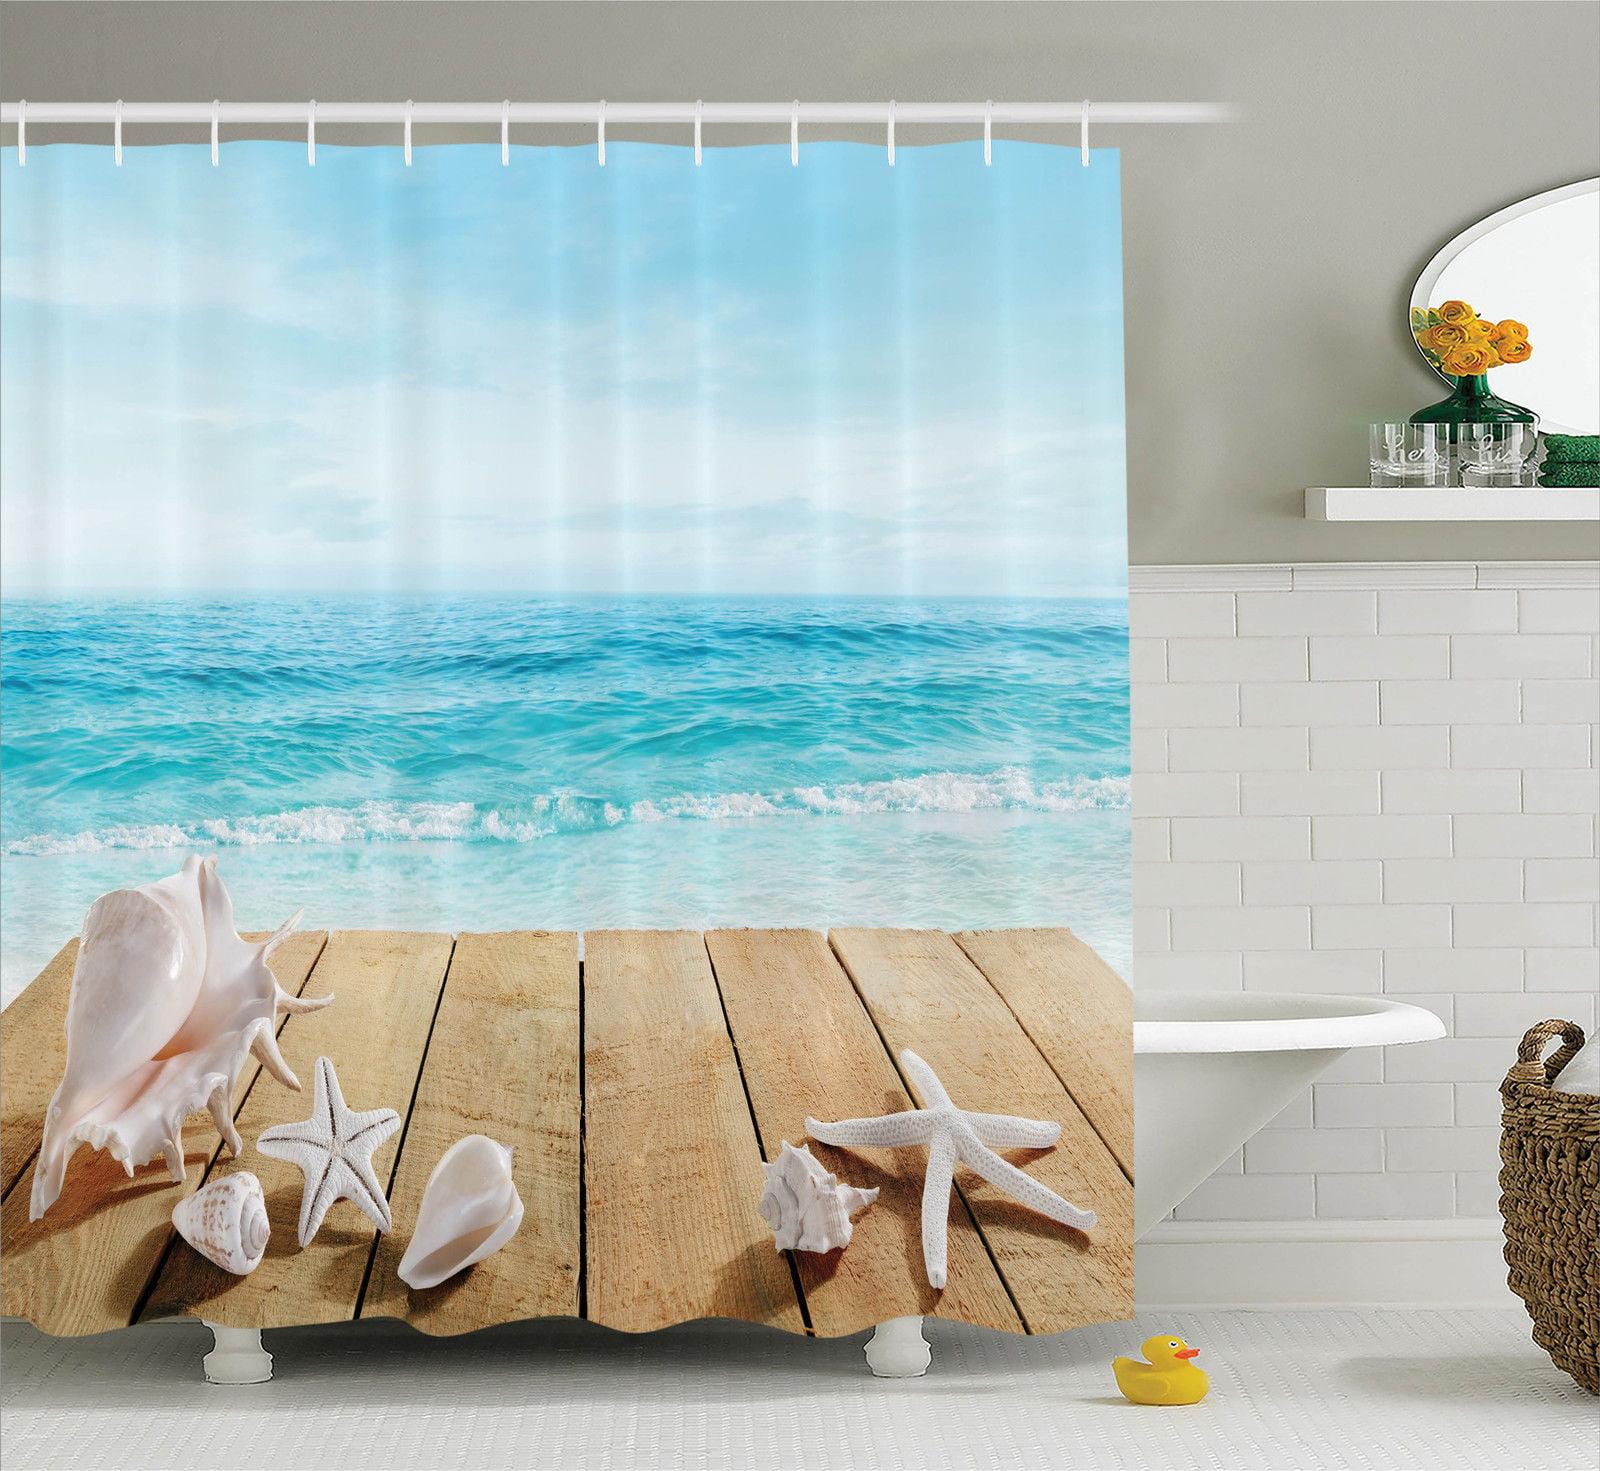 Seashells Decor Shower Curtain Set Wooden Boardwald With Seashells Resort Sunshine Vacations Maldives Deck Waves Beach Theme Bathroom Accessories